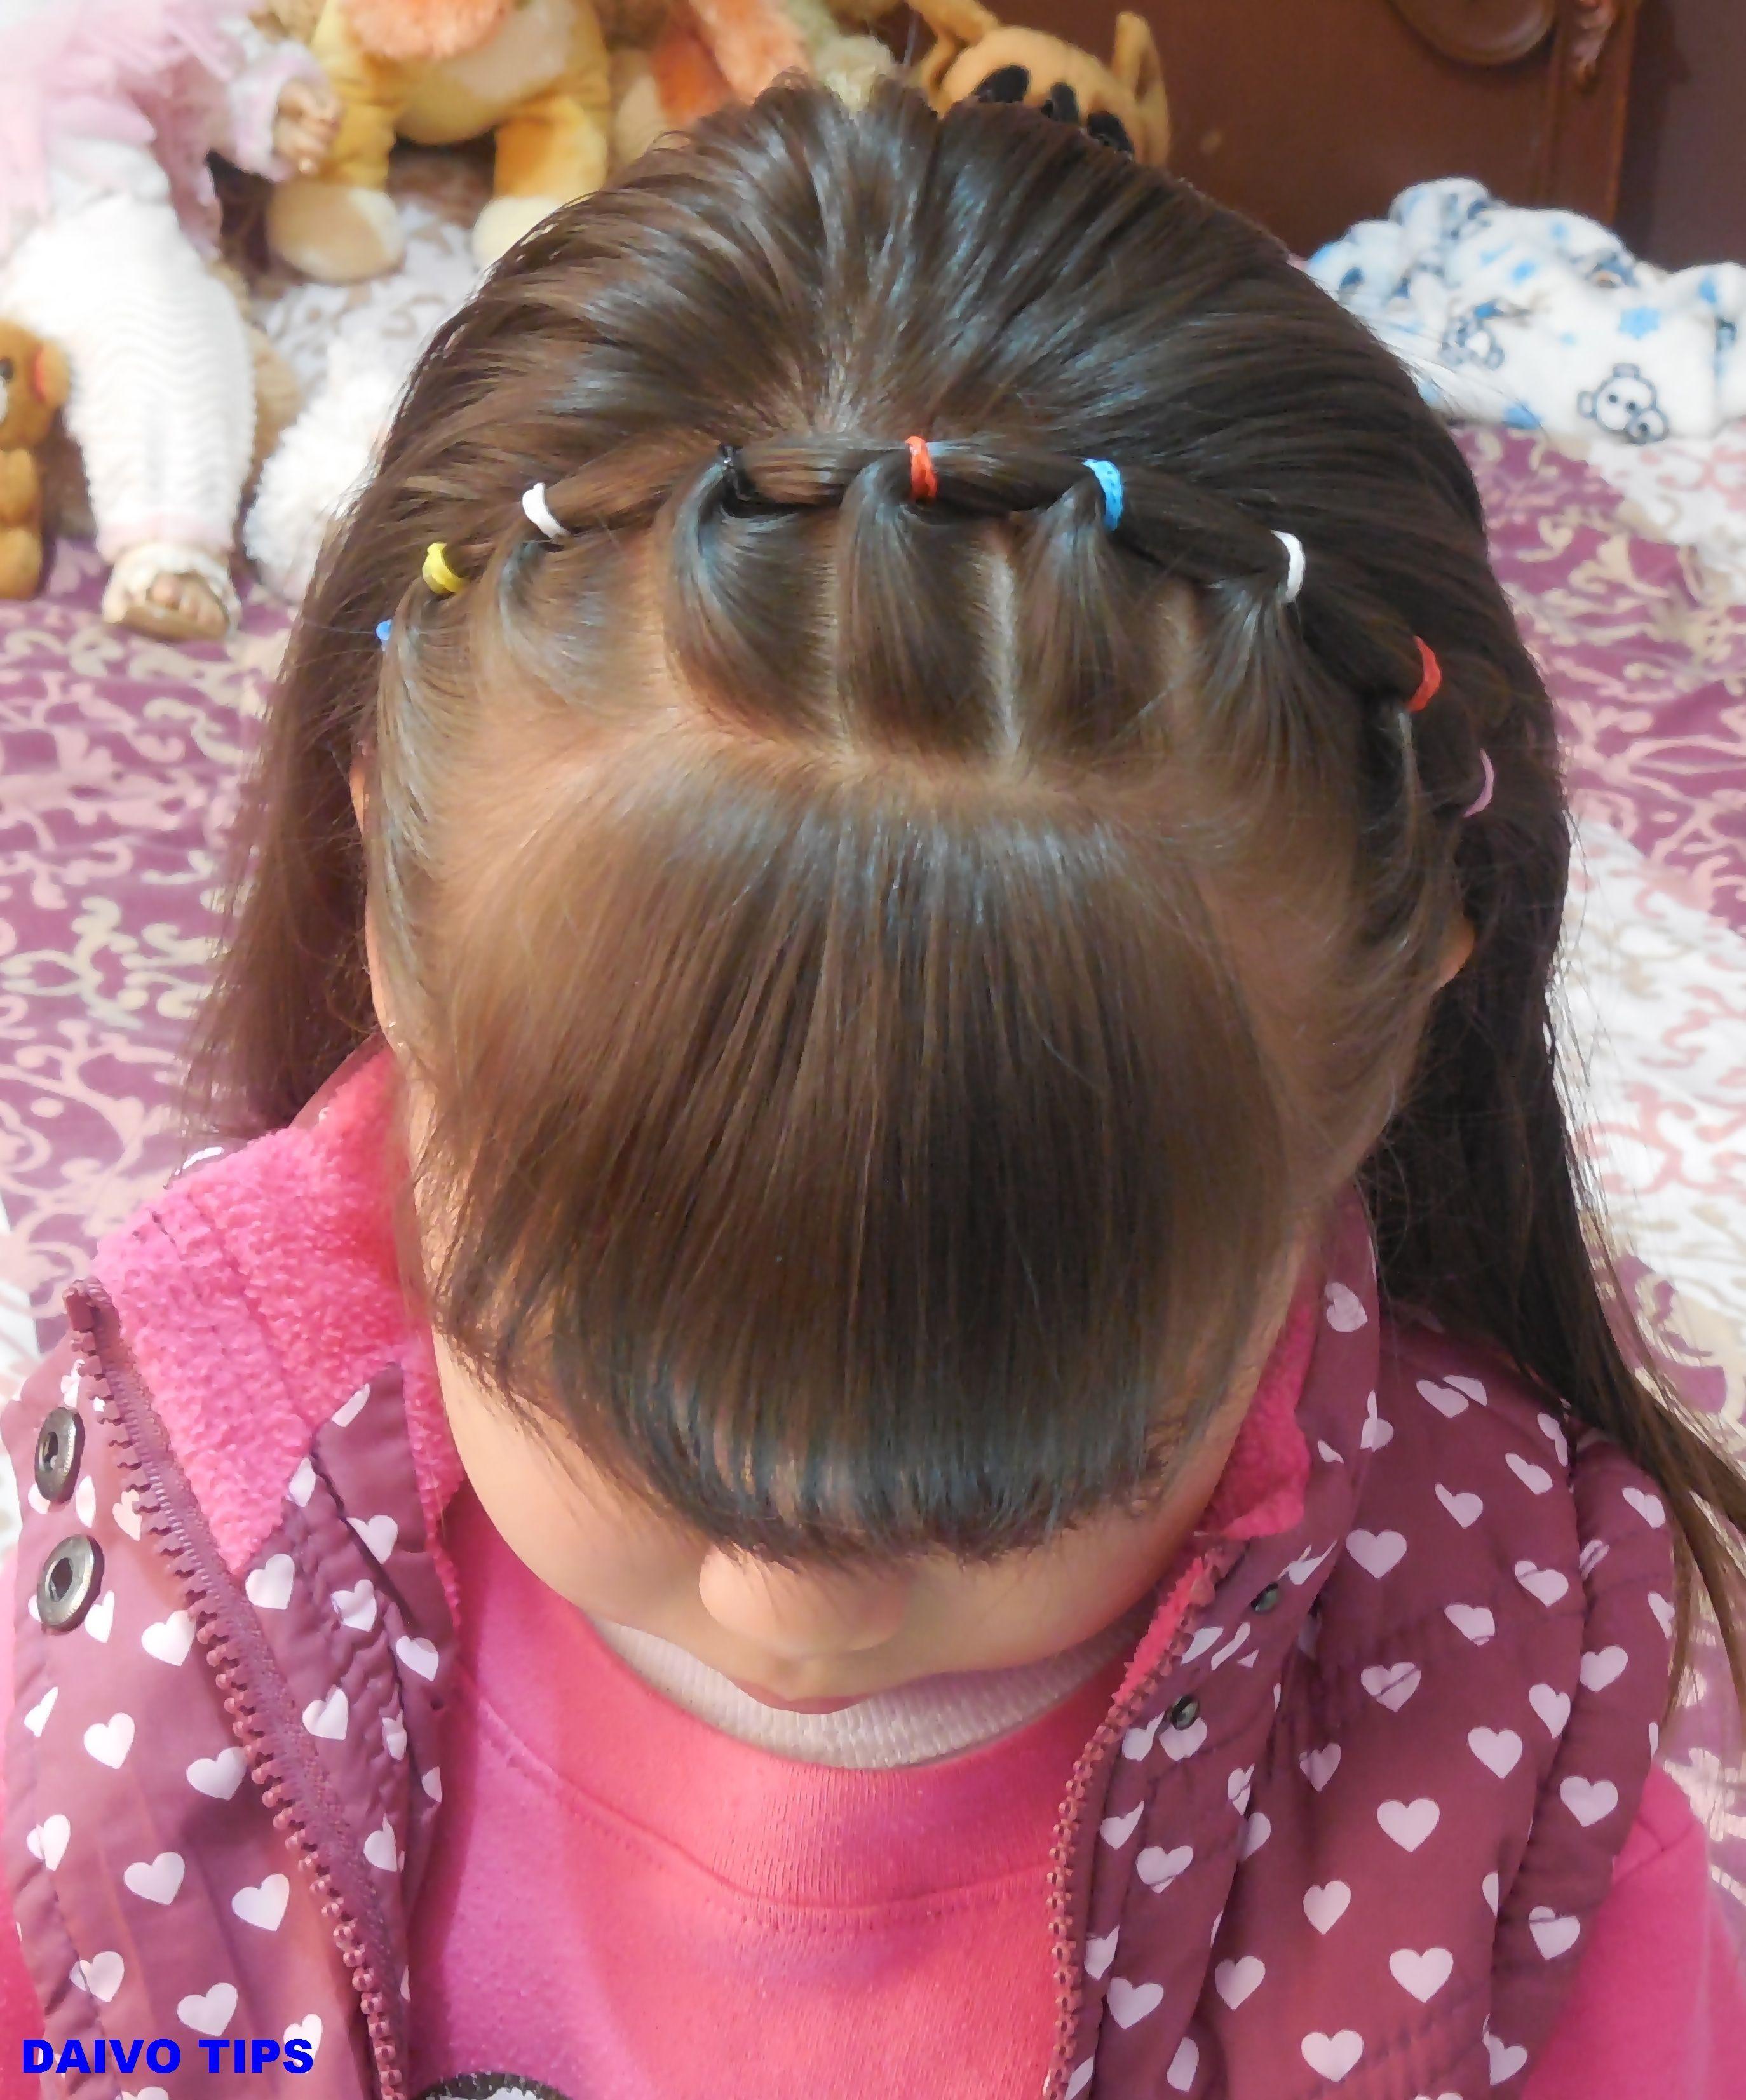 Peinado facil diadema con ligas peinadosfaciles braided